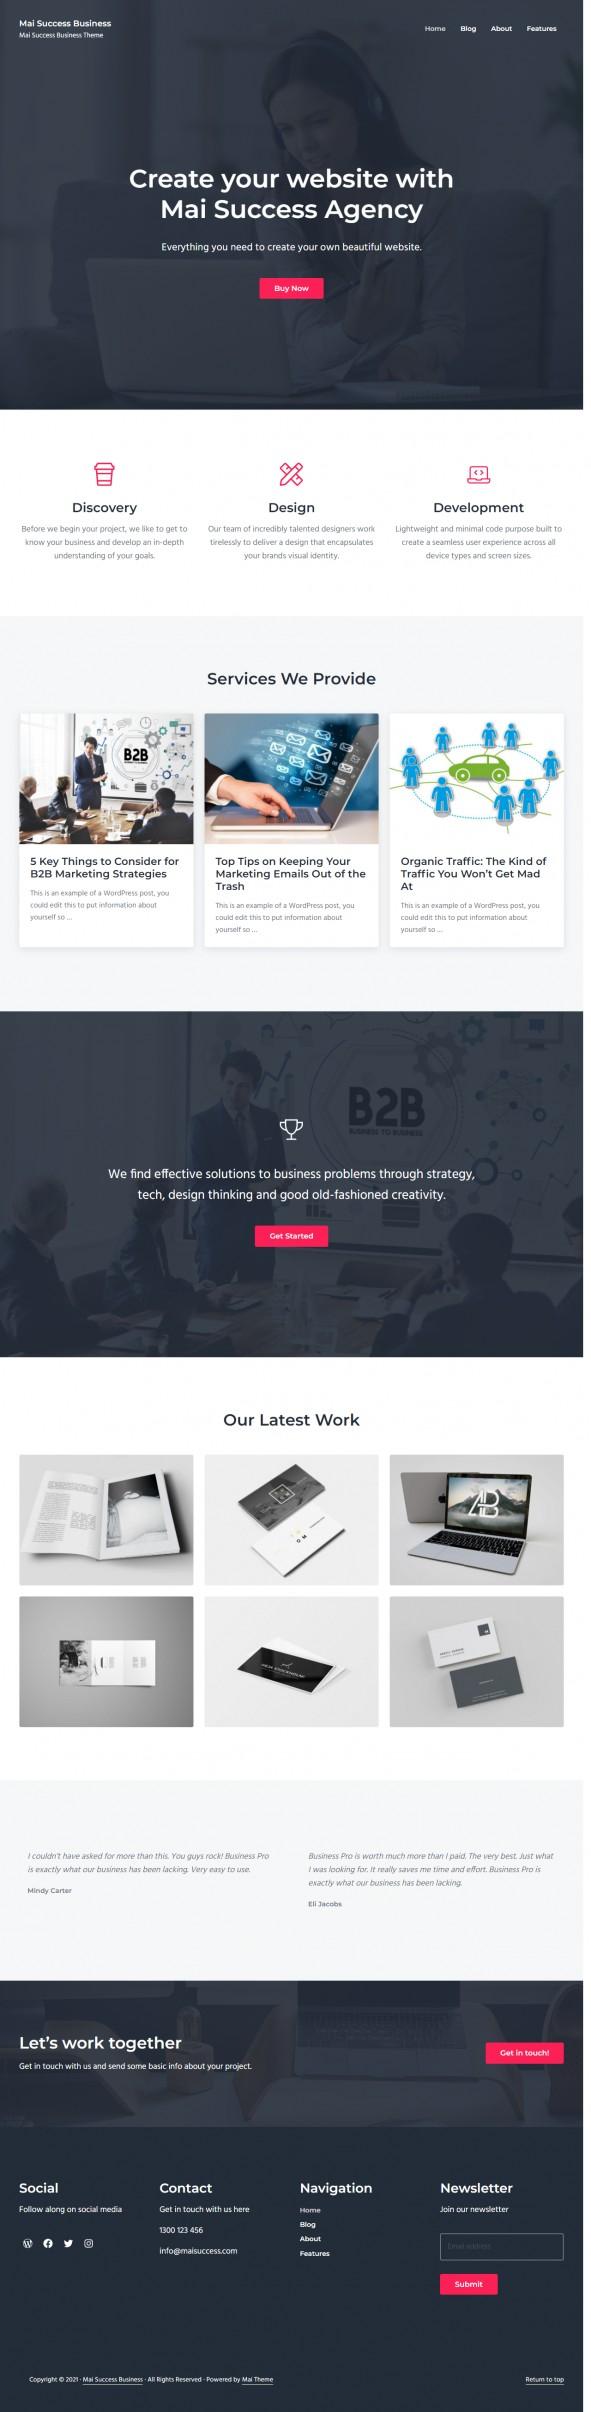 Mai Success Business Theme Demo - StudioPress for Genesis